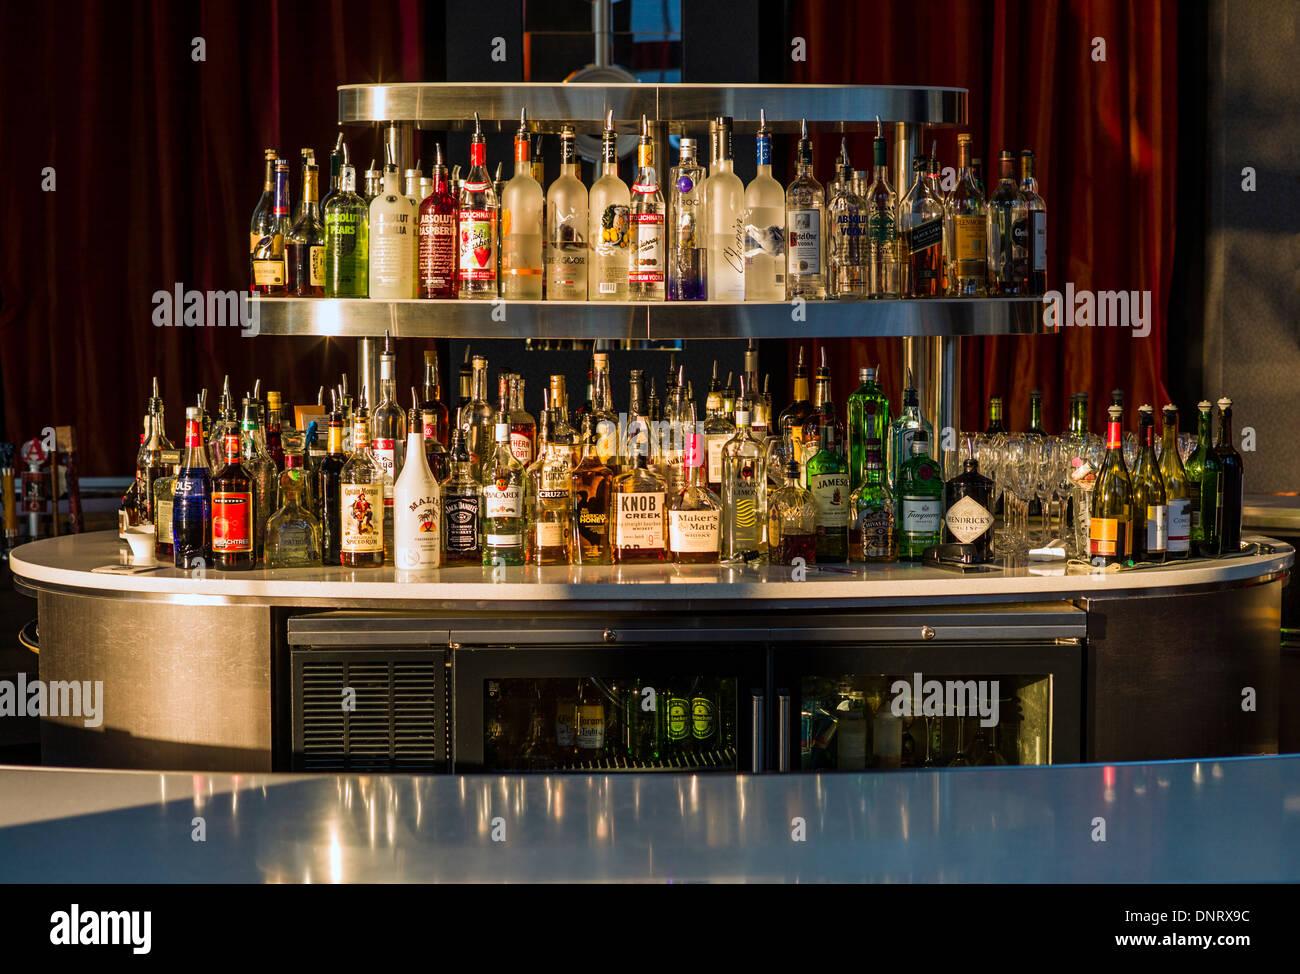 Early morning light illuminates a hotel bar in downtown Denver, Colorado, USA - Stock Image